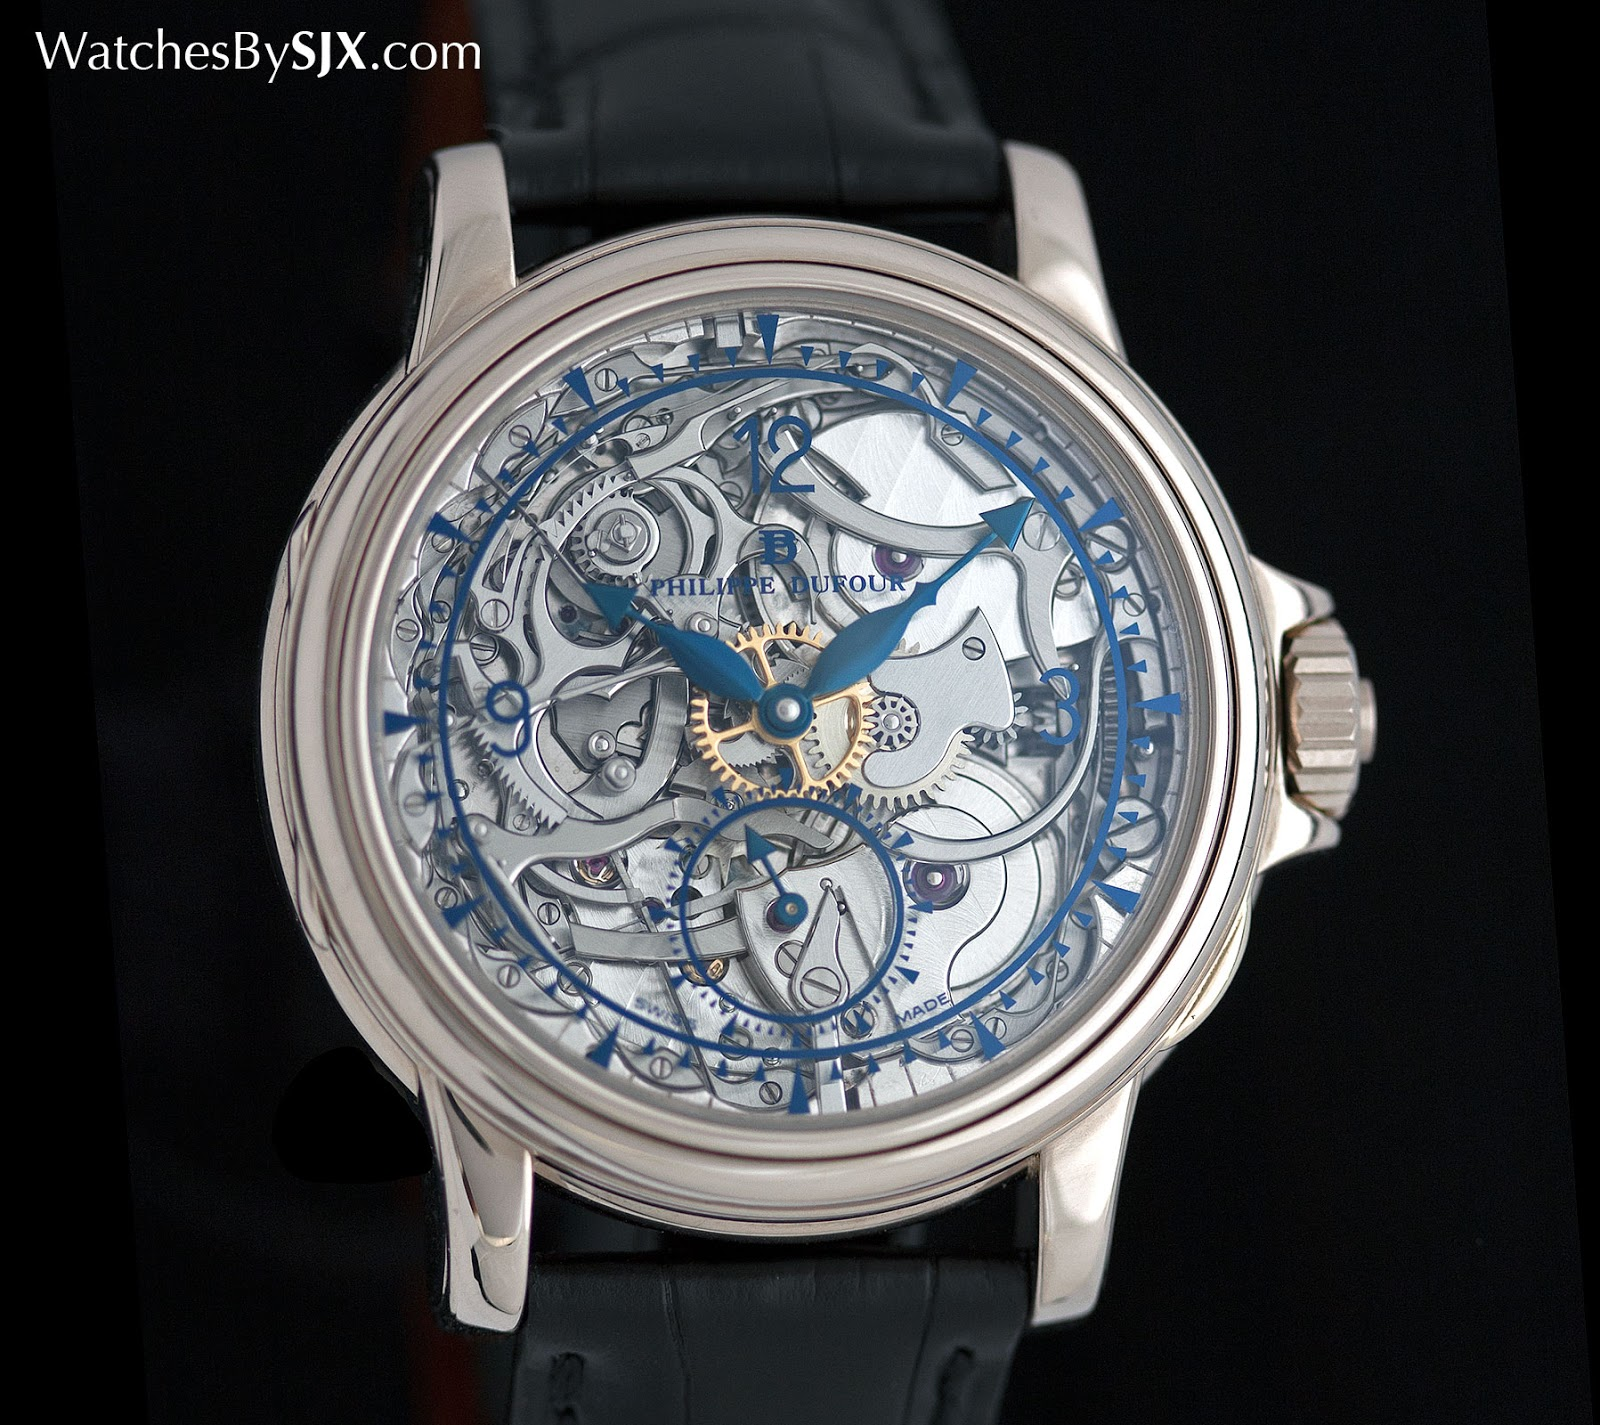 Philippe Dufour Grande Sonnerie Wristwatch Skeleton 1.jpg